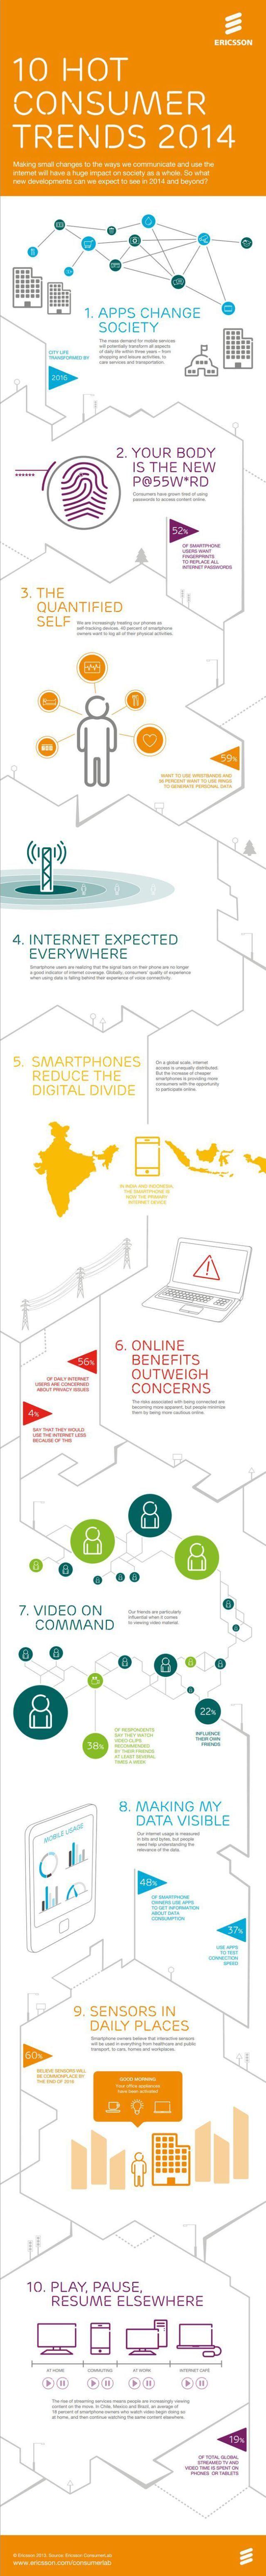 10 hot consumer trends 2014 #infografia #infographic #marketing